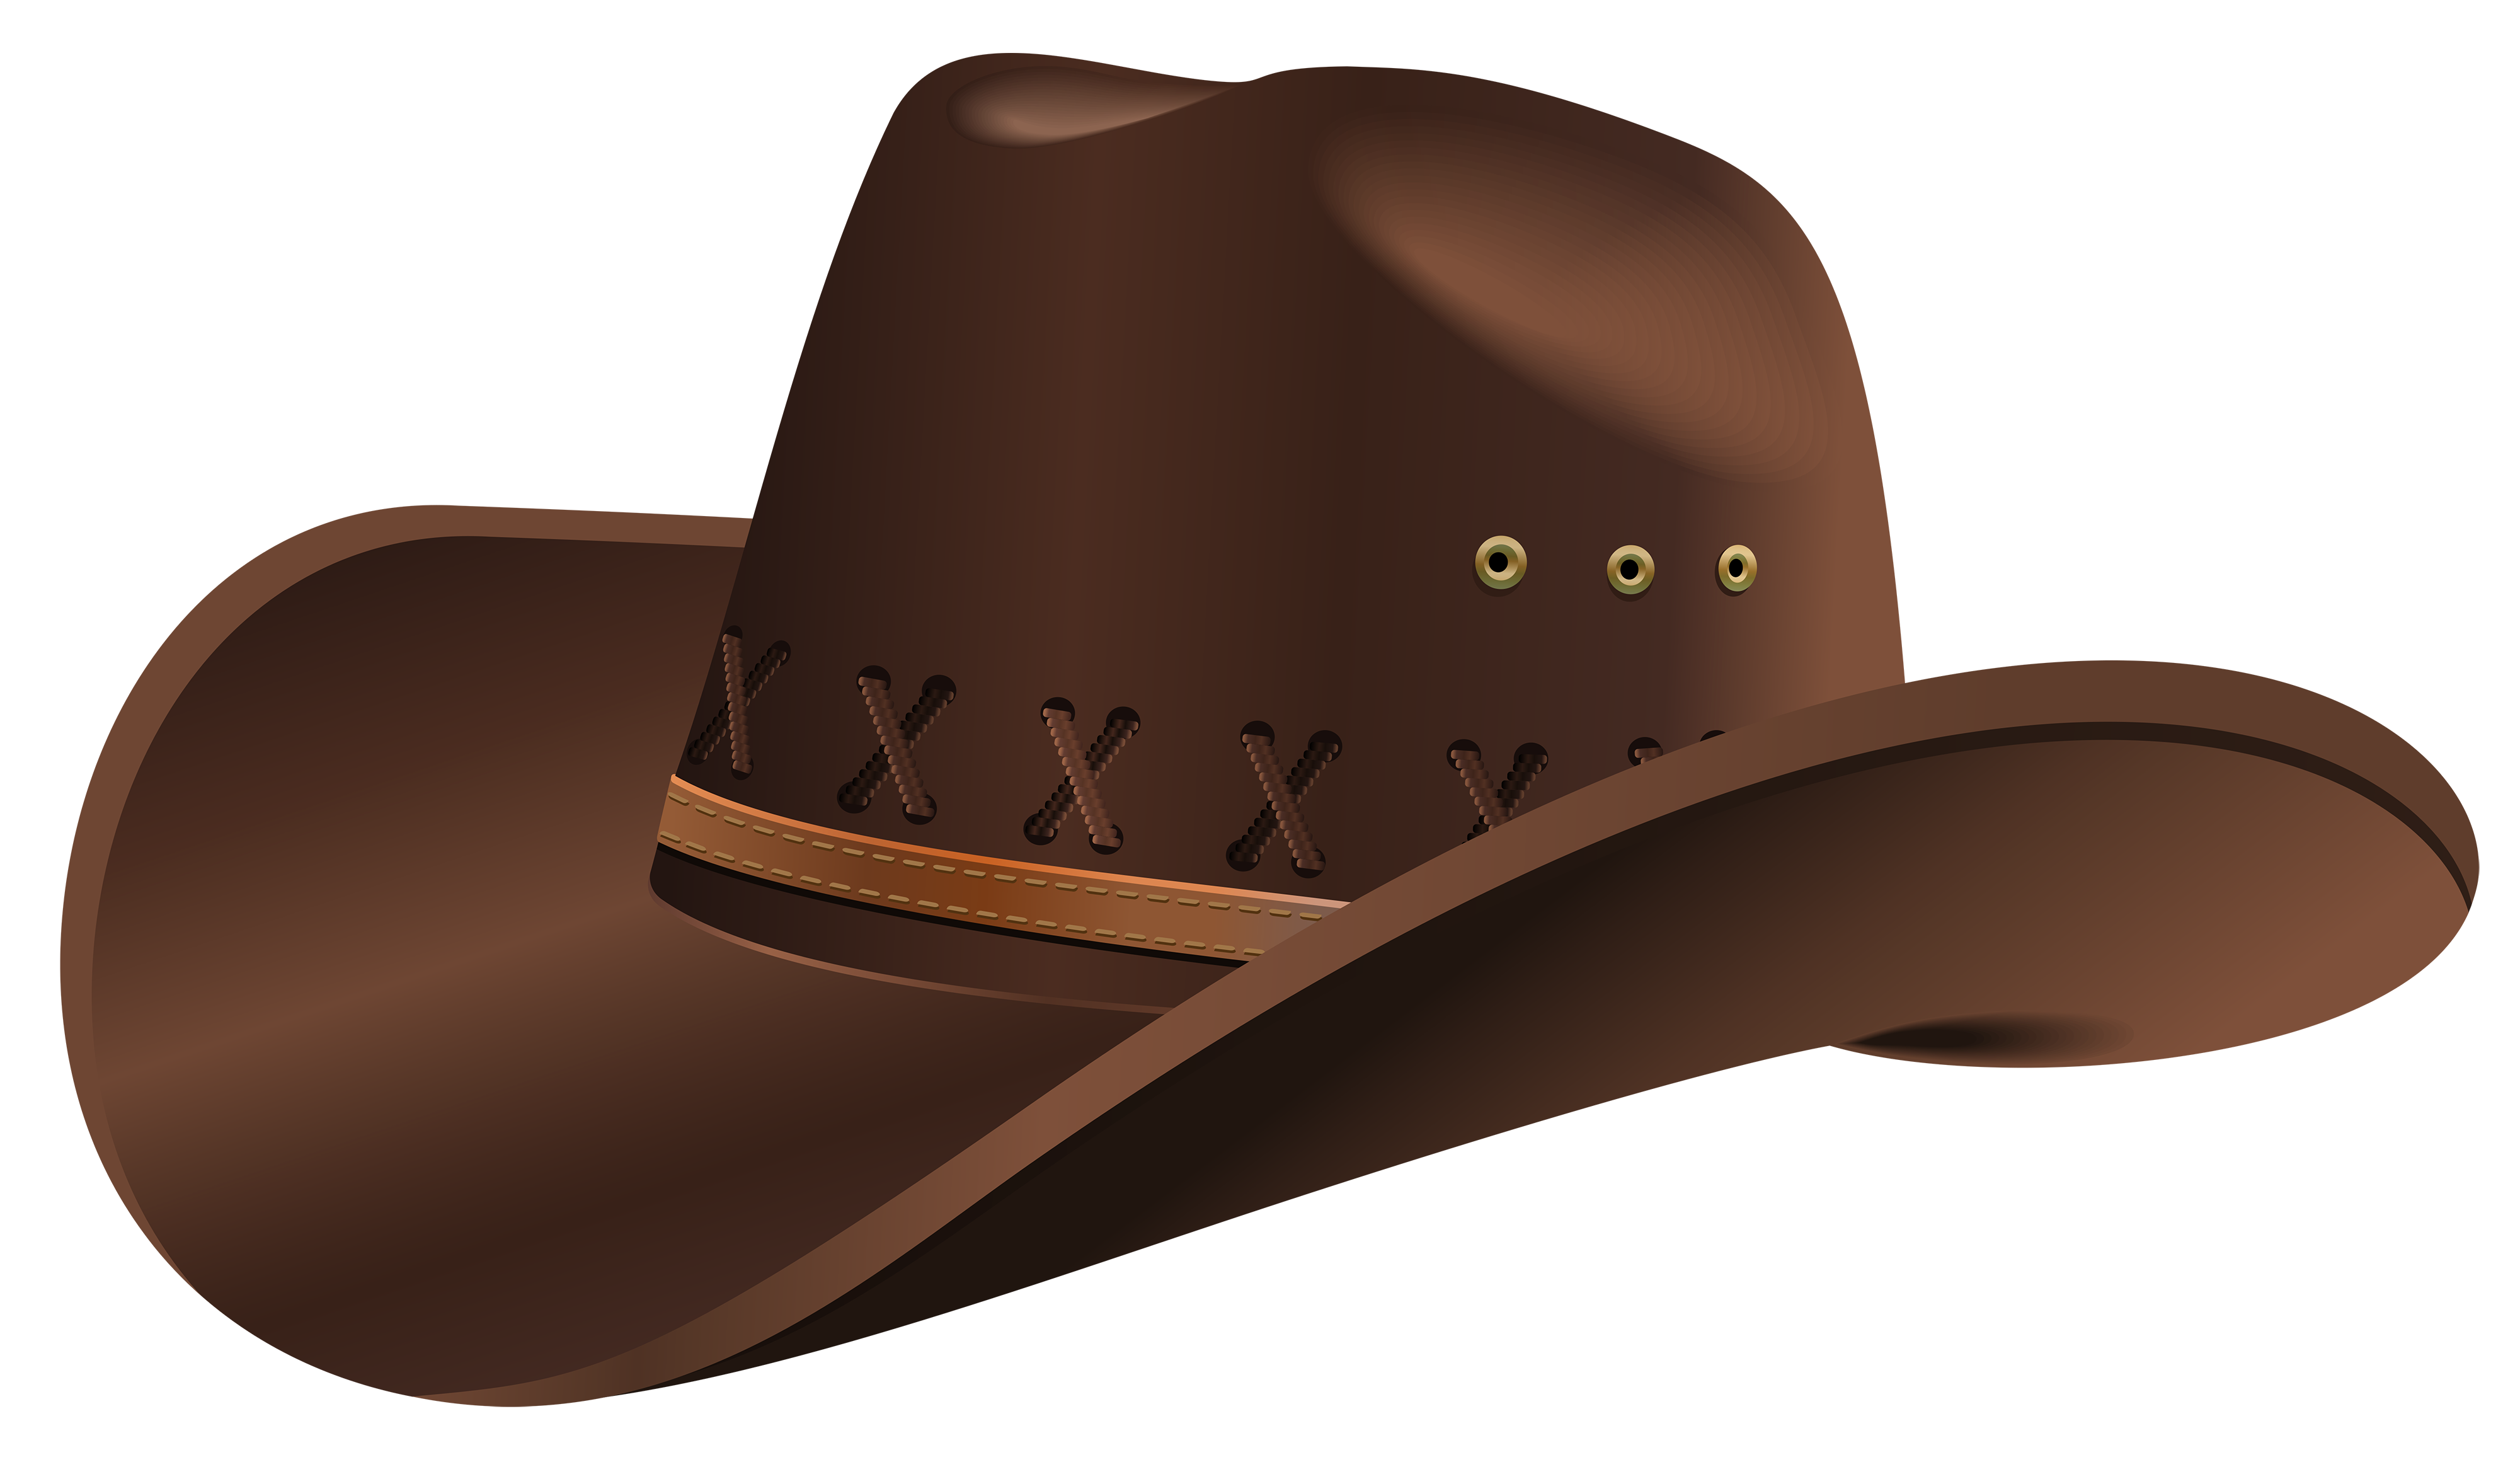 Clip Art Hat Cowboy Free Download Png Hq Dibujos De Vaqueros Adornos Vaqueros Para Fiesta Dibujos De Sombreros